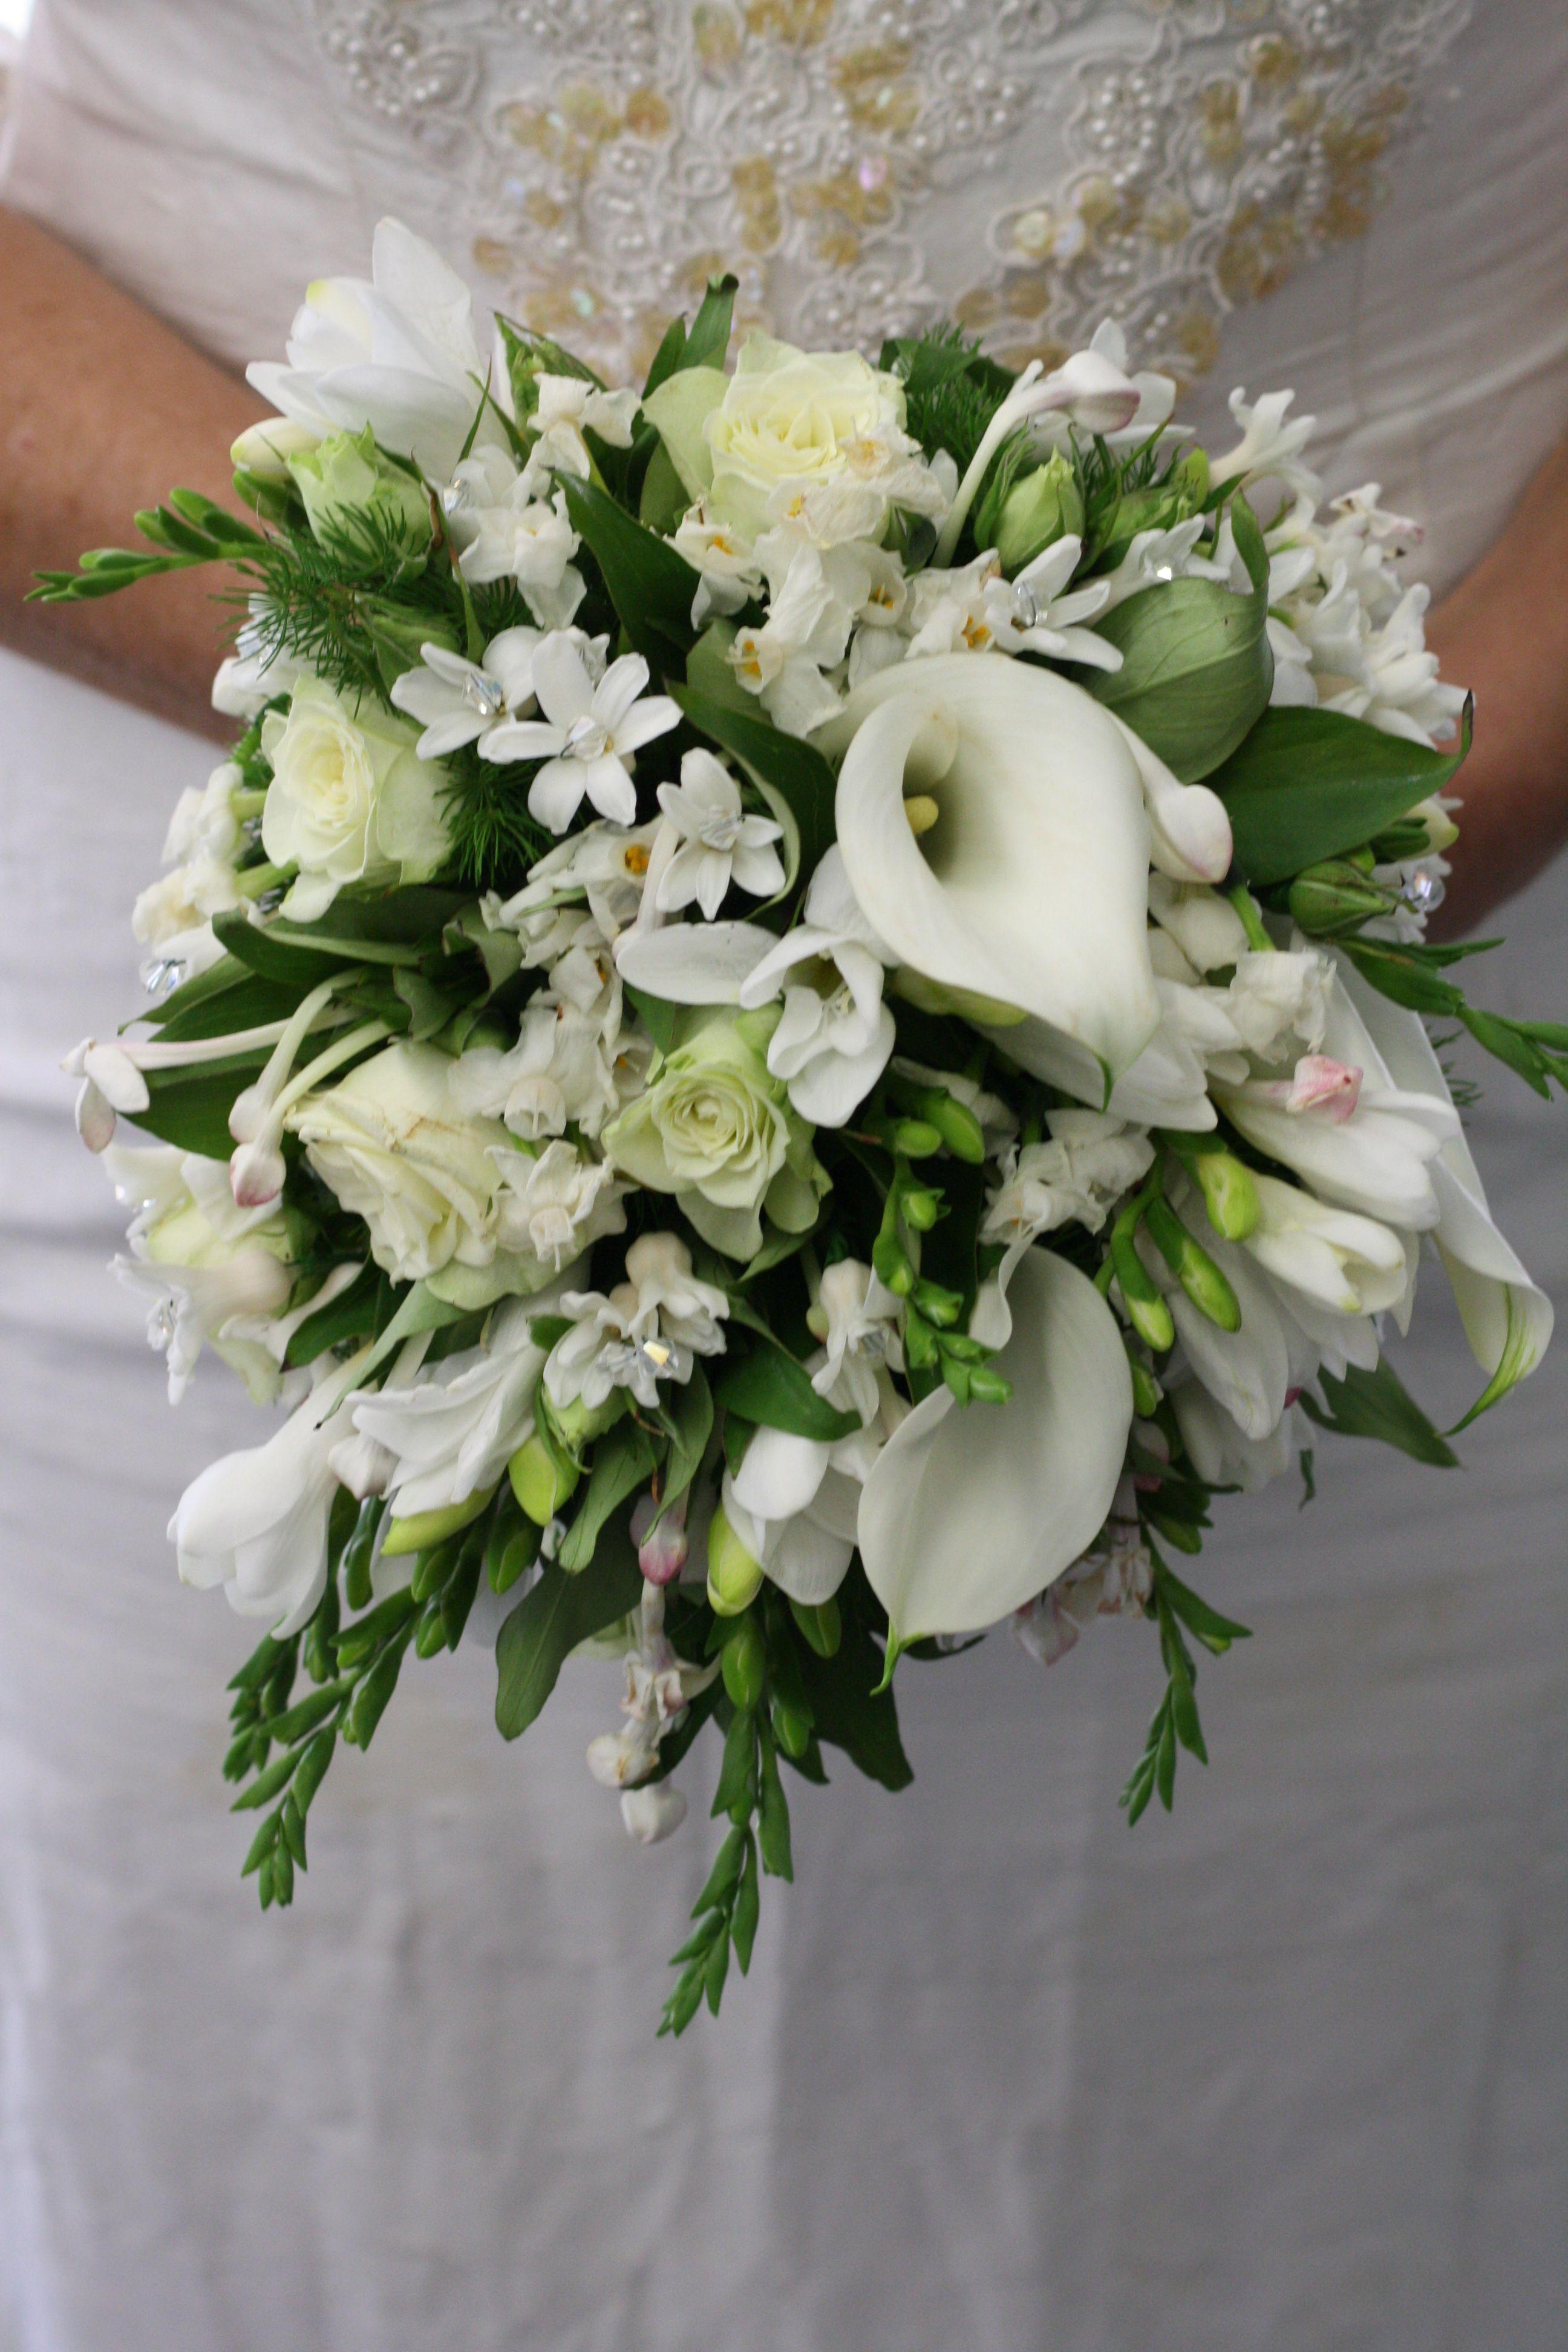 Princess kate inspired vintage bouquet calla lilies wedding and kate inspired wedding bouquet white calla lilies freesias stephanotis hyacinthroses dhlflorist Choice Image